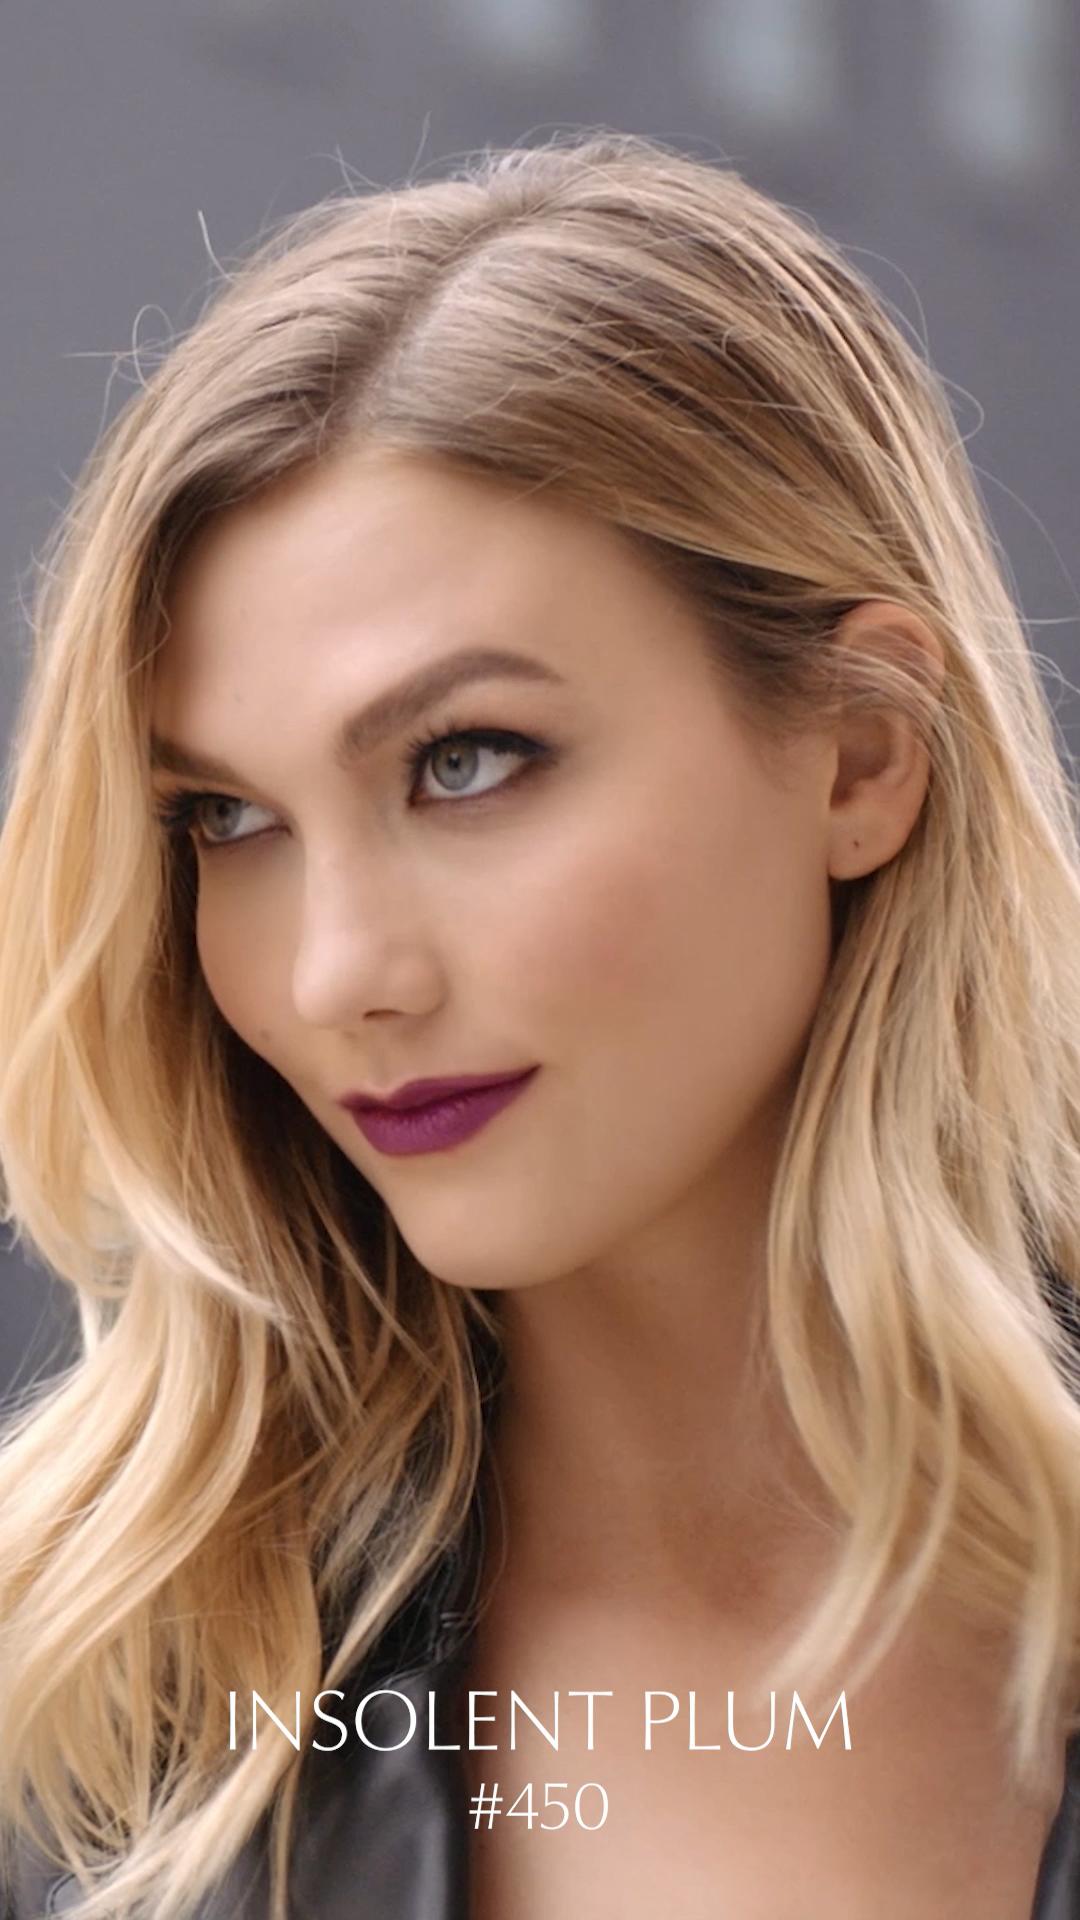 Discover Pure Color Envy Lipstick